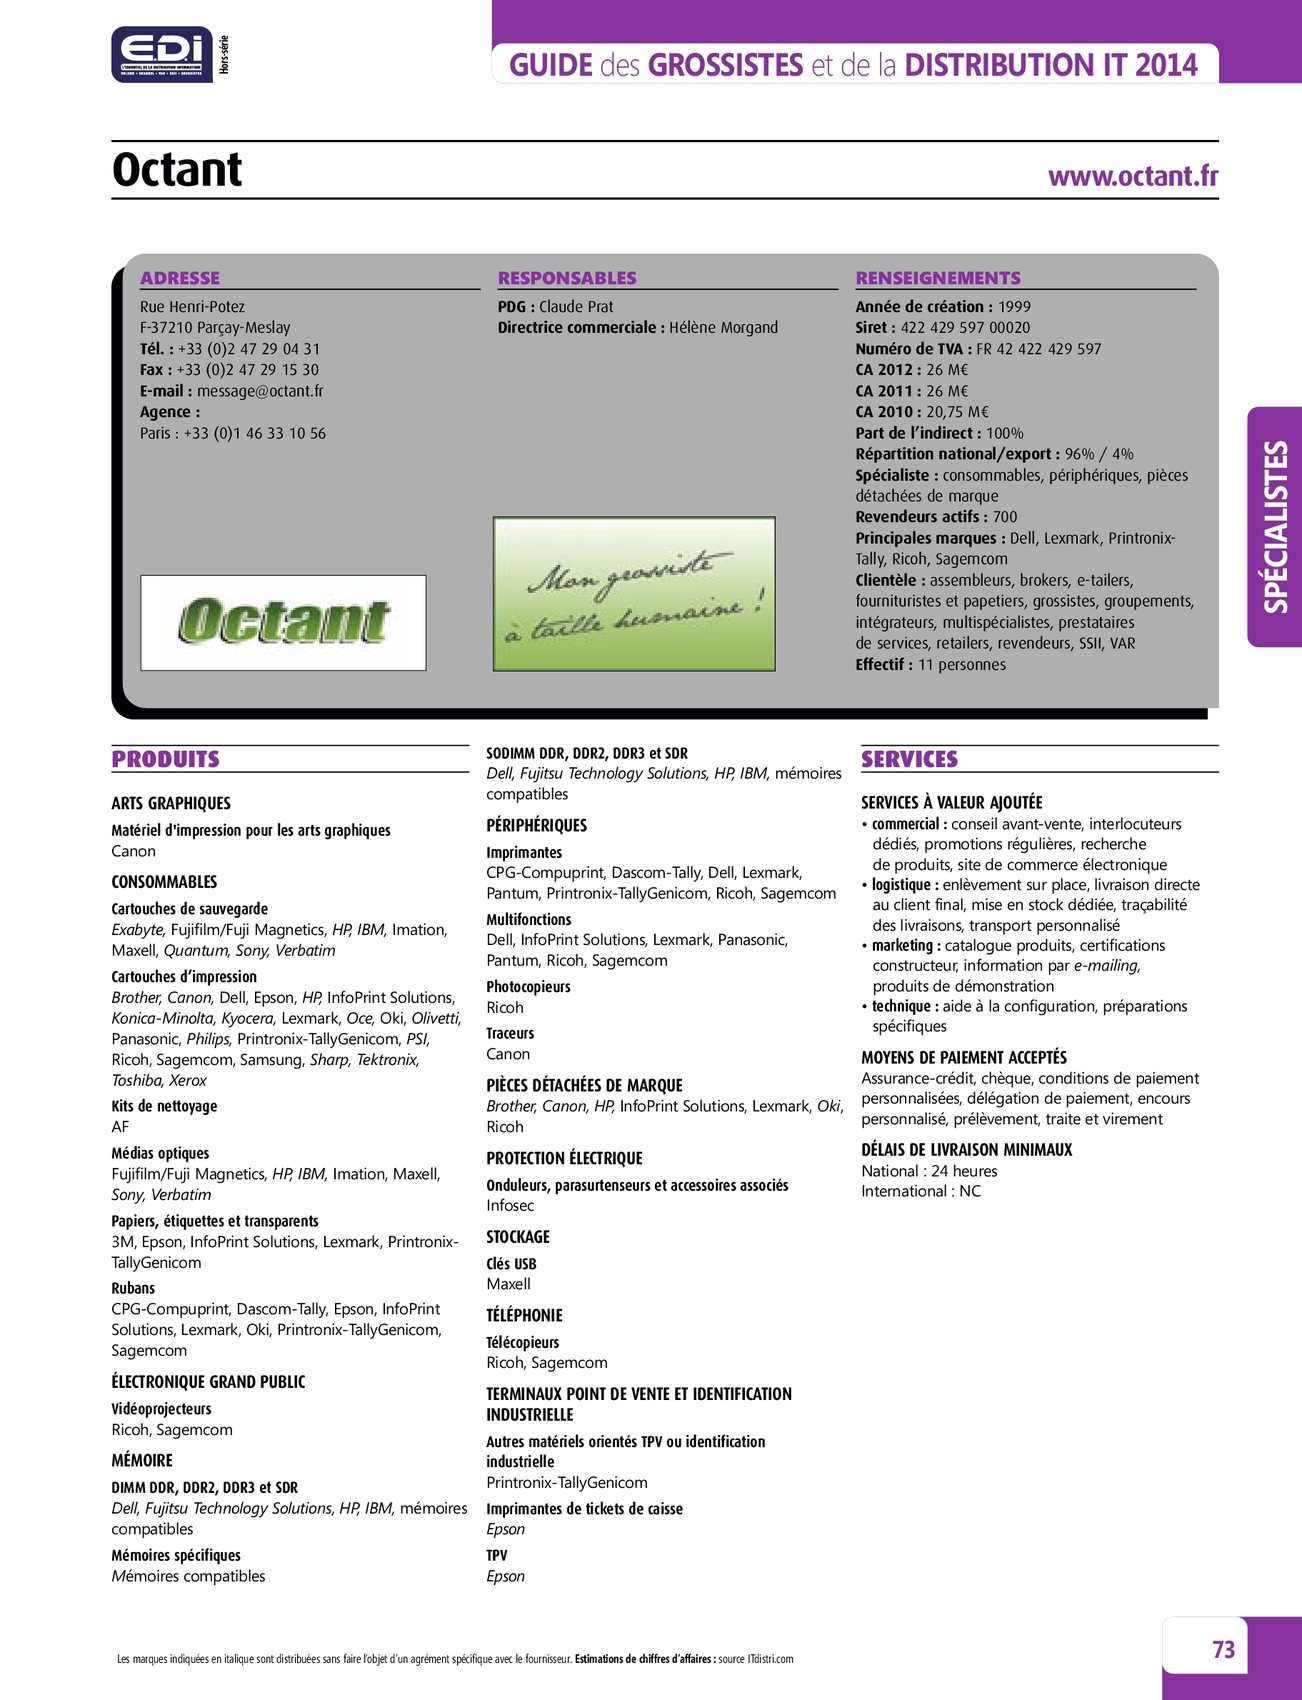 Guide de la distribution IT en France en 2013-2014 - CALAMEO